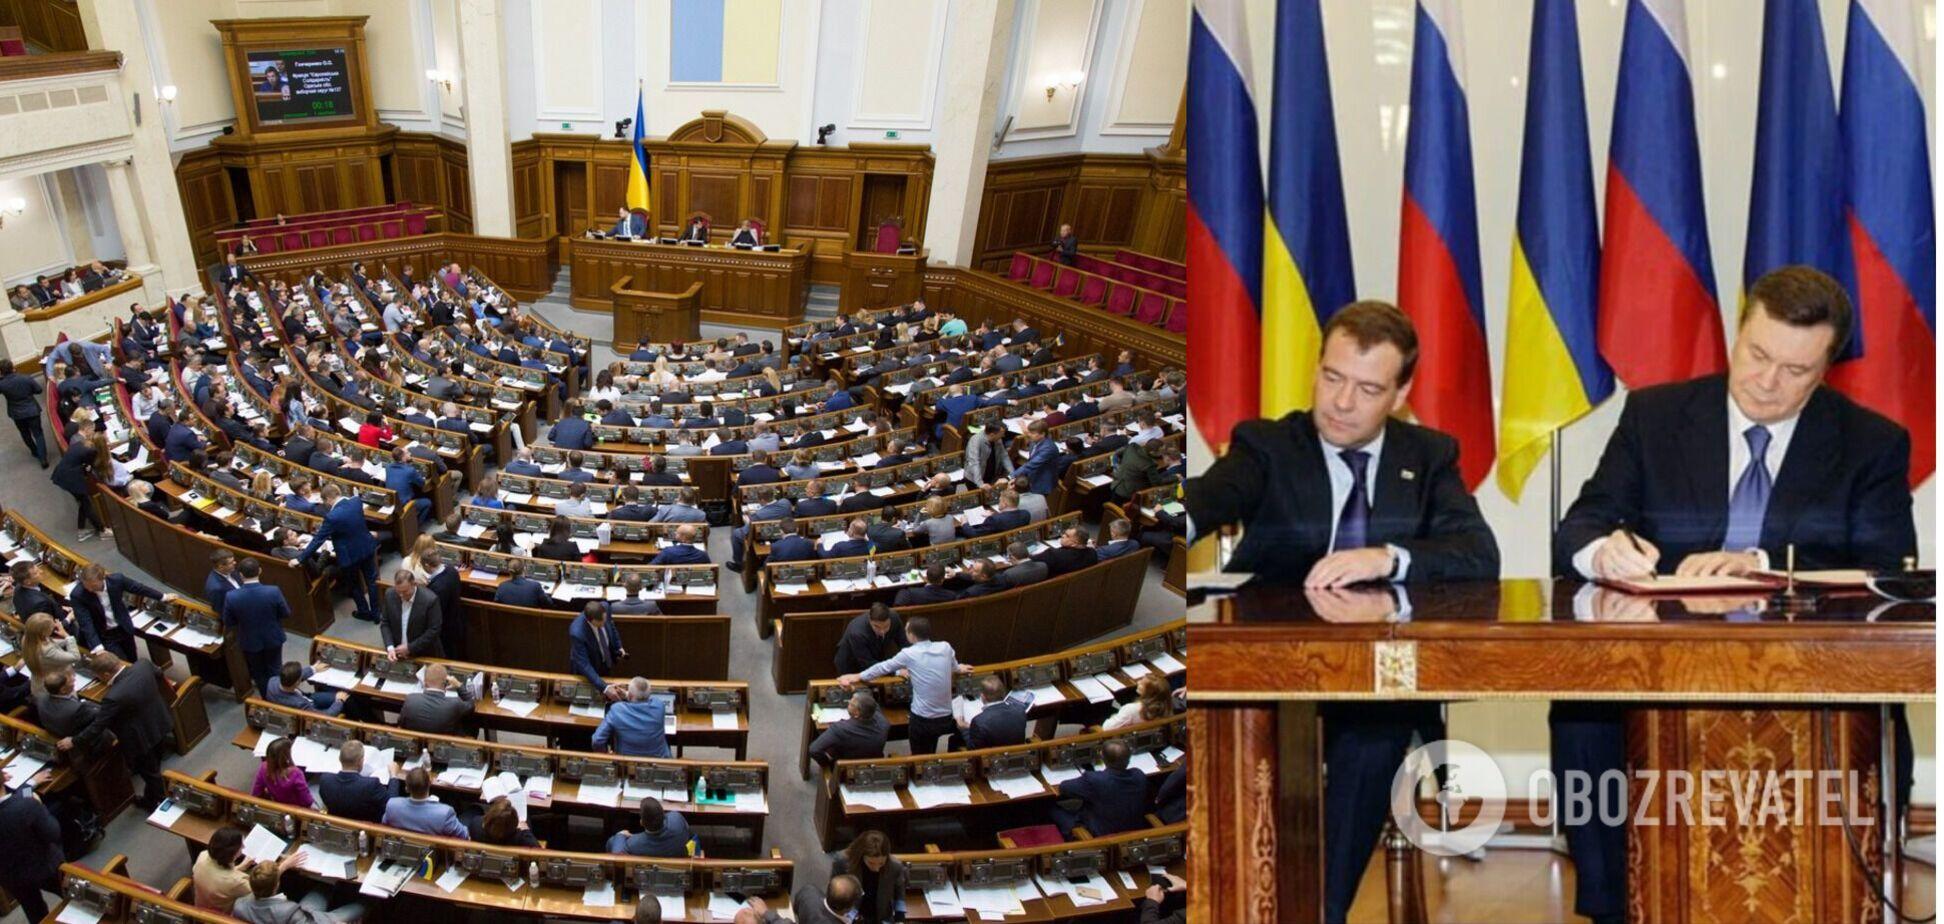 'Слуги' внесли в Раду законопроєкт про припинення Харківських угод. Документ